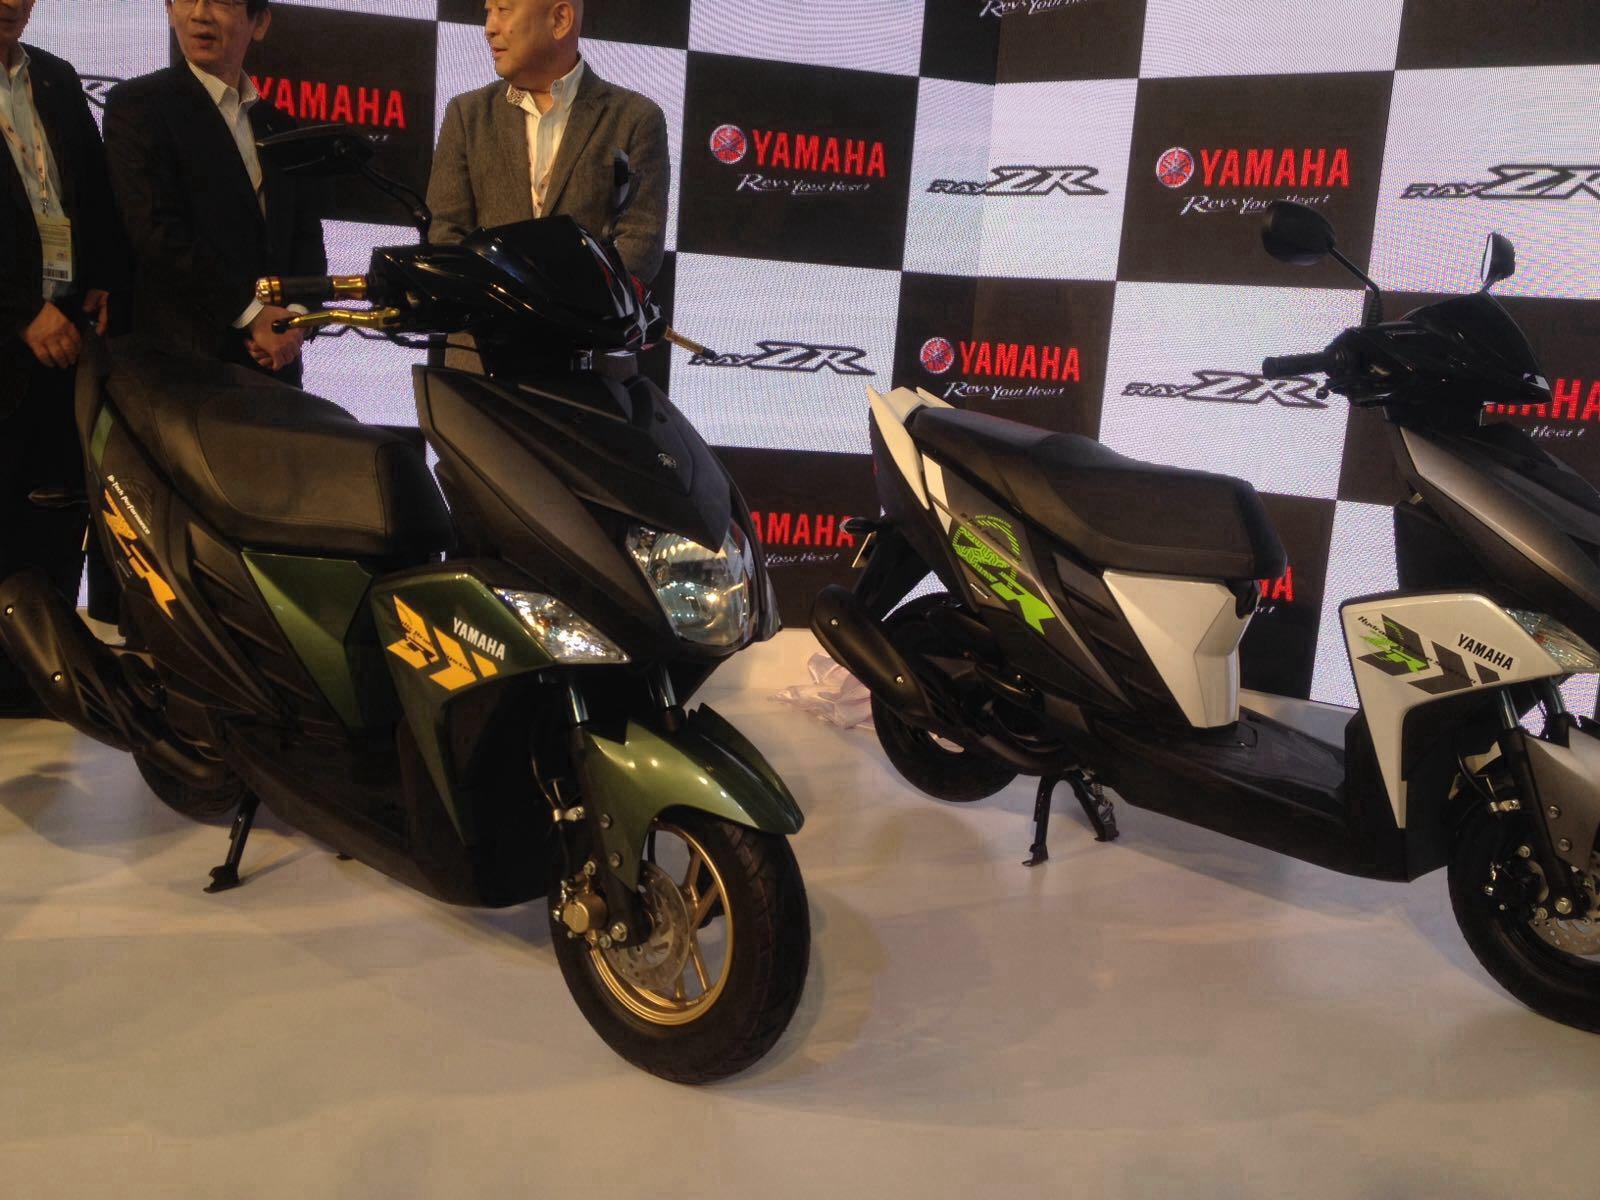 Yamaha Cygnus Ray Zr Unveiled At Auto Expo 2016 Autocar